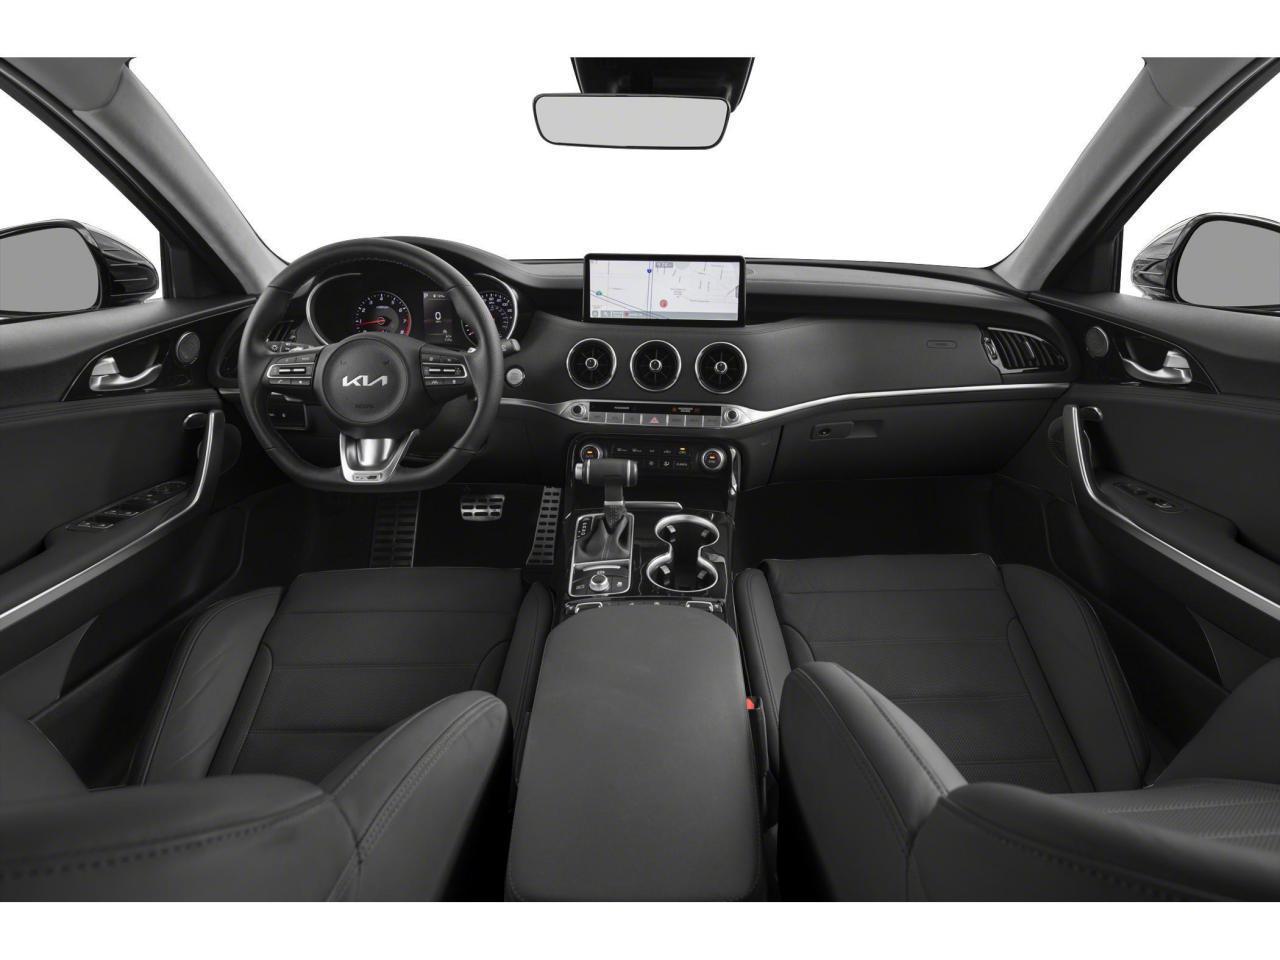 2022 Kia Stinger GT ELITE BLACK INT.